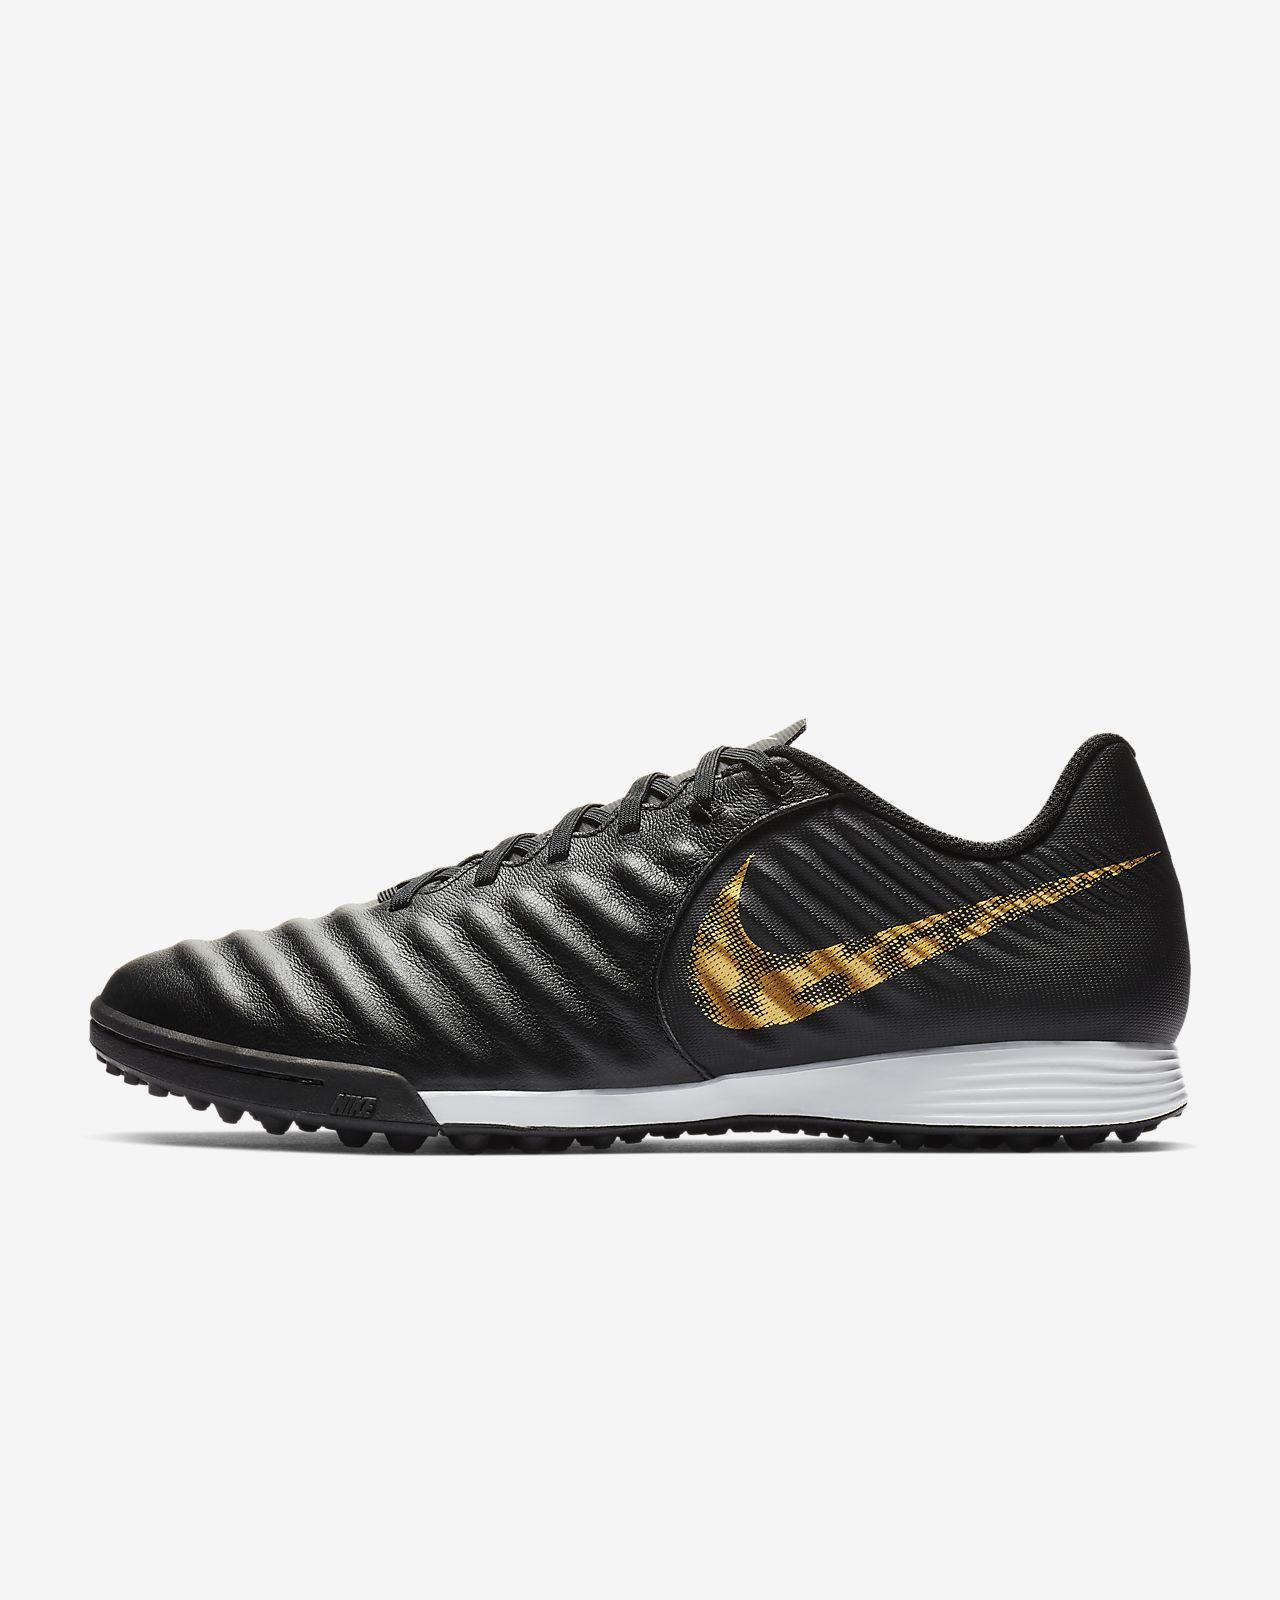 4ffa9a8003af7 ... Nike LegendX 7 Academy TF Botas de fútbol para hierba artificial o  moqueta - Turf